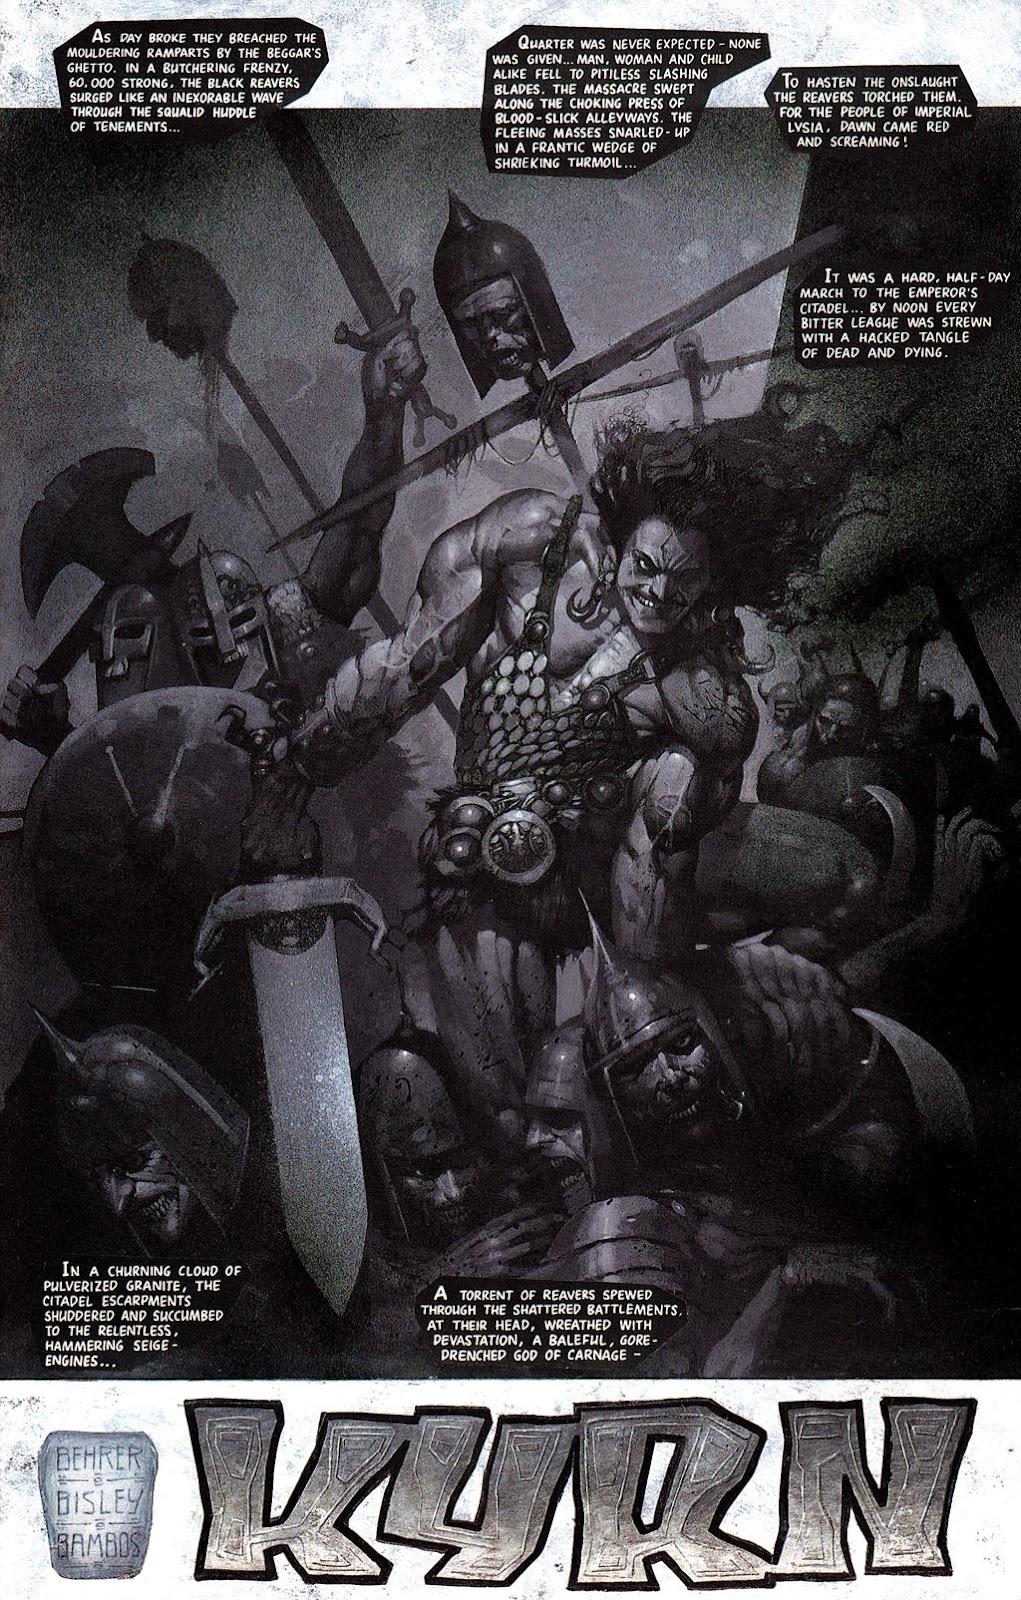 Read online Bisley's Scrapbook comic -  Issue # Full - 21